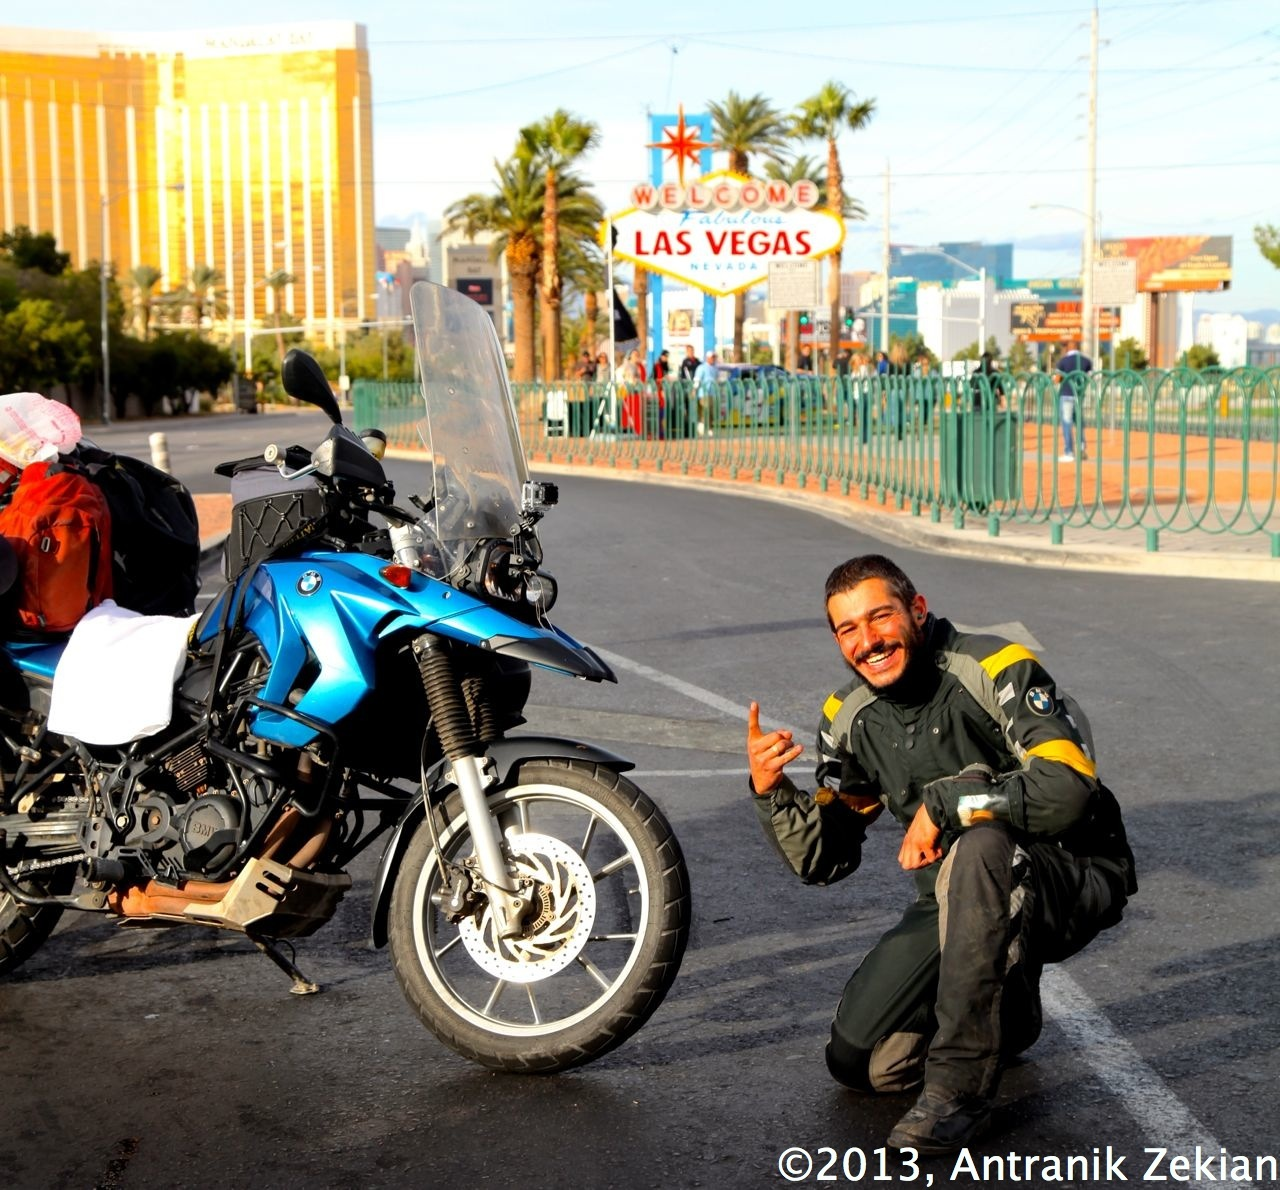 Welcome to Fabulous Vegas